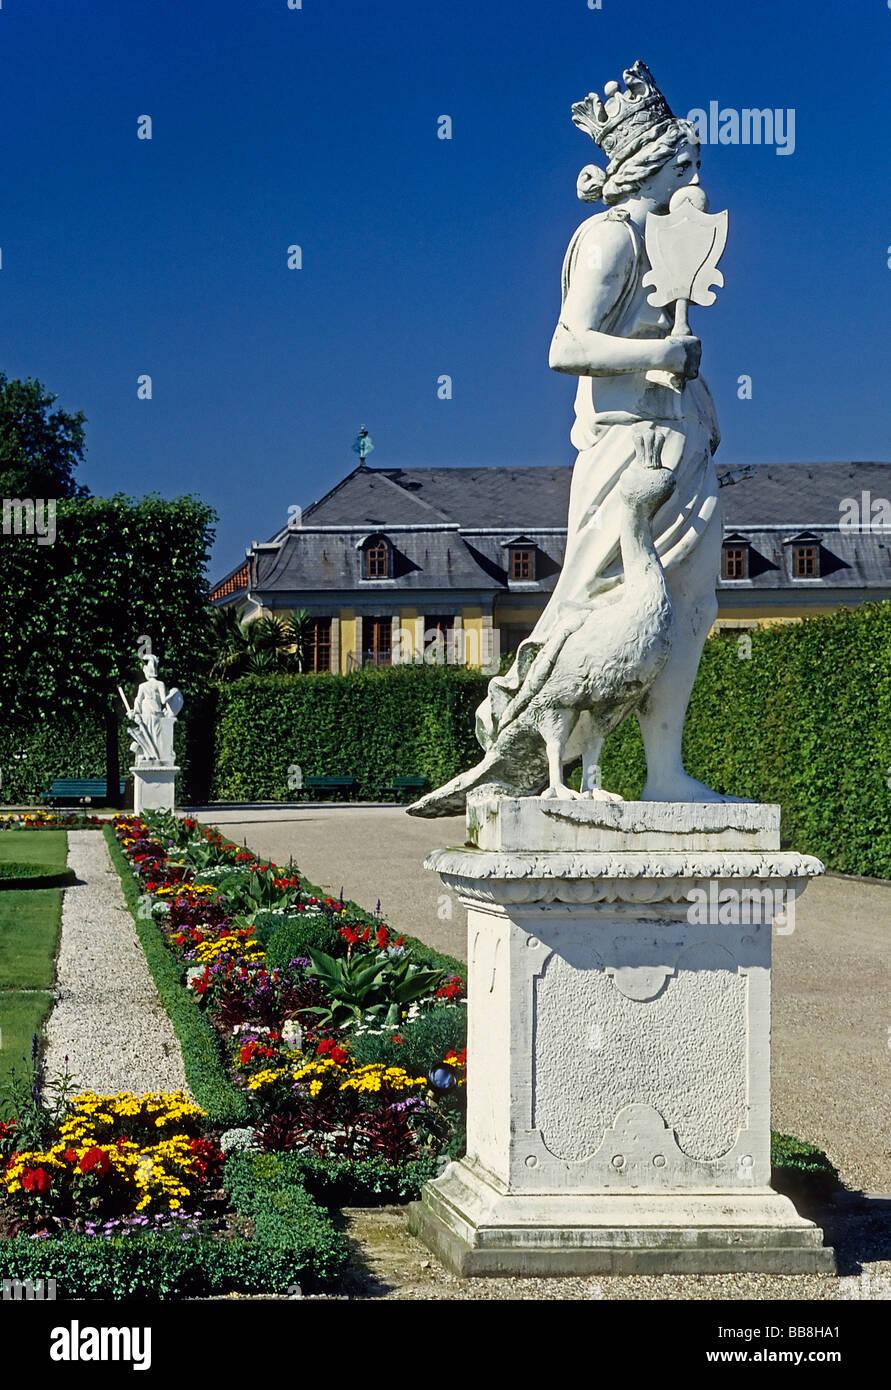 Allegorical statue, woman with crown and peacock, Grosser Garten, Large Garden, Herrenhaeuser Gardens, Hanover, - Stock Image